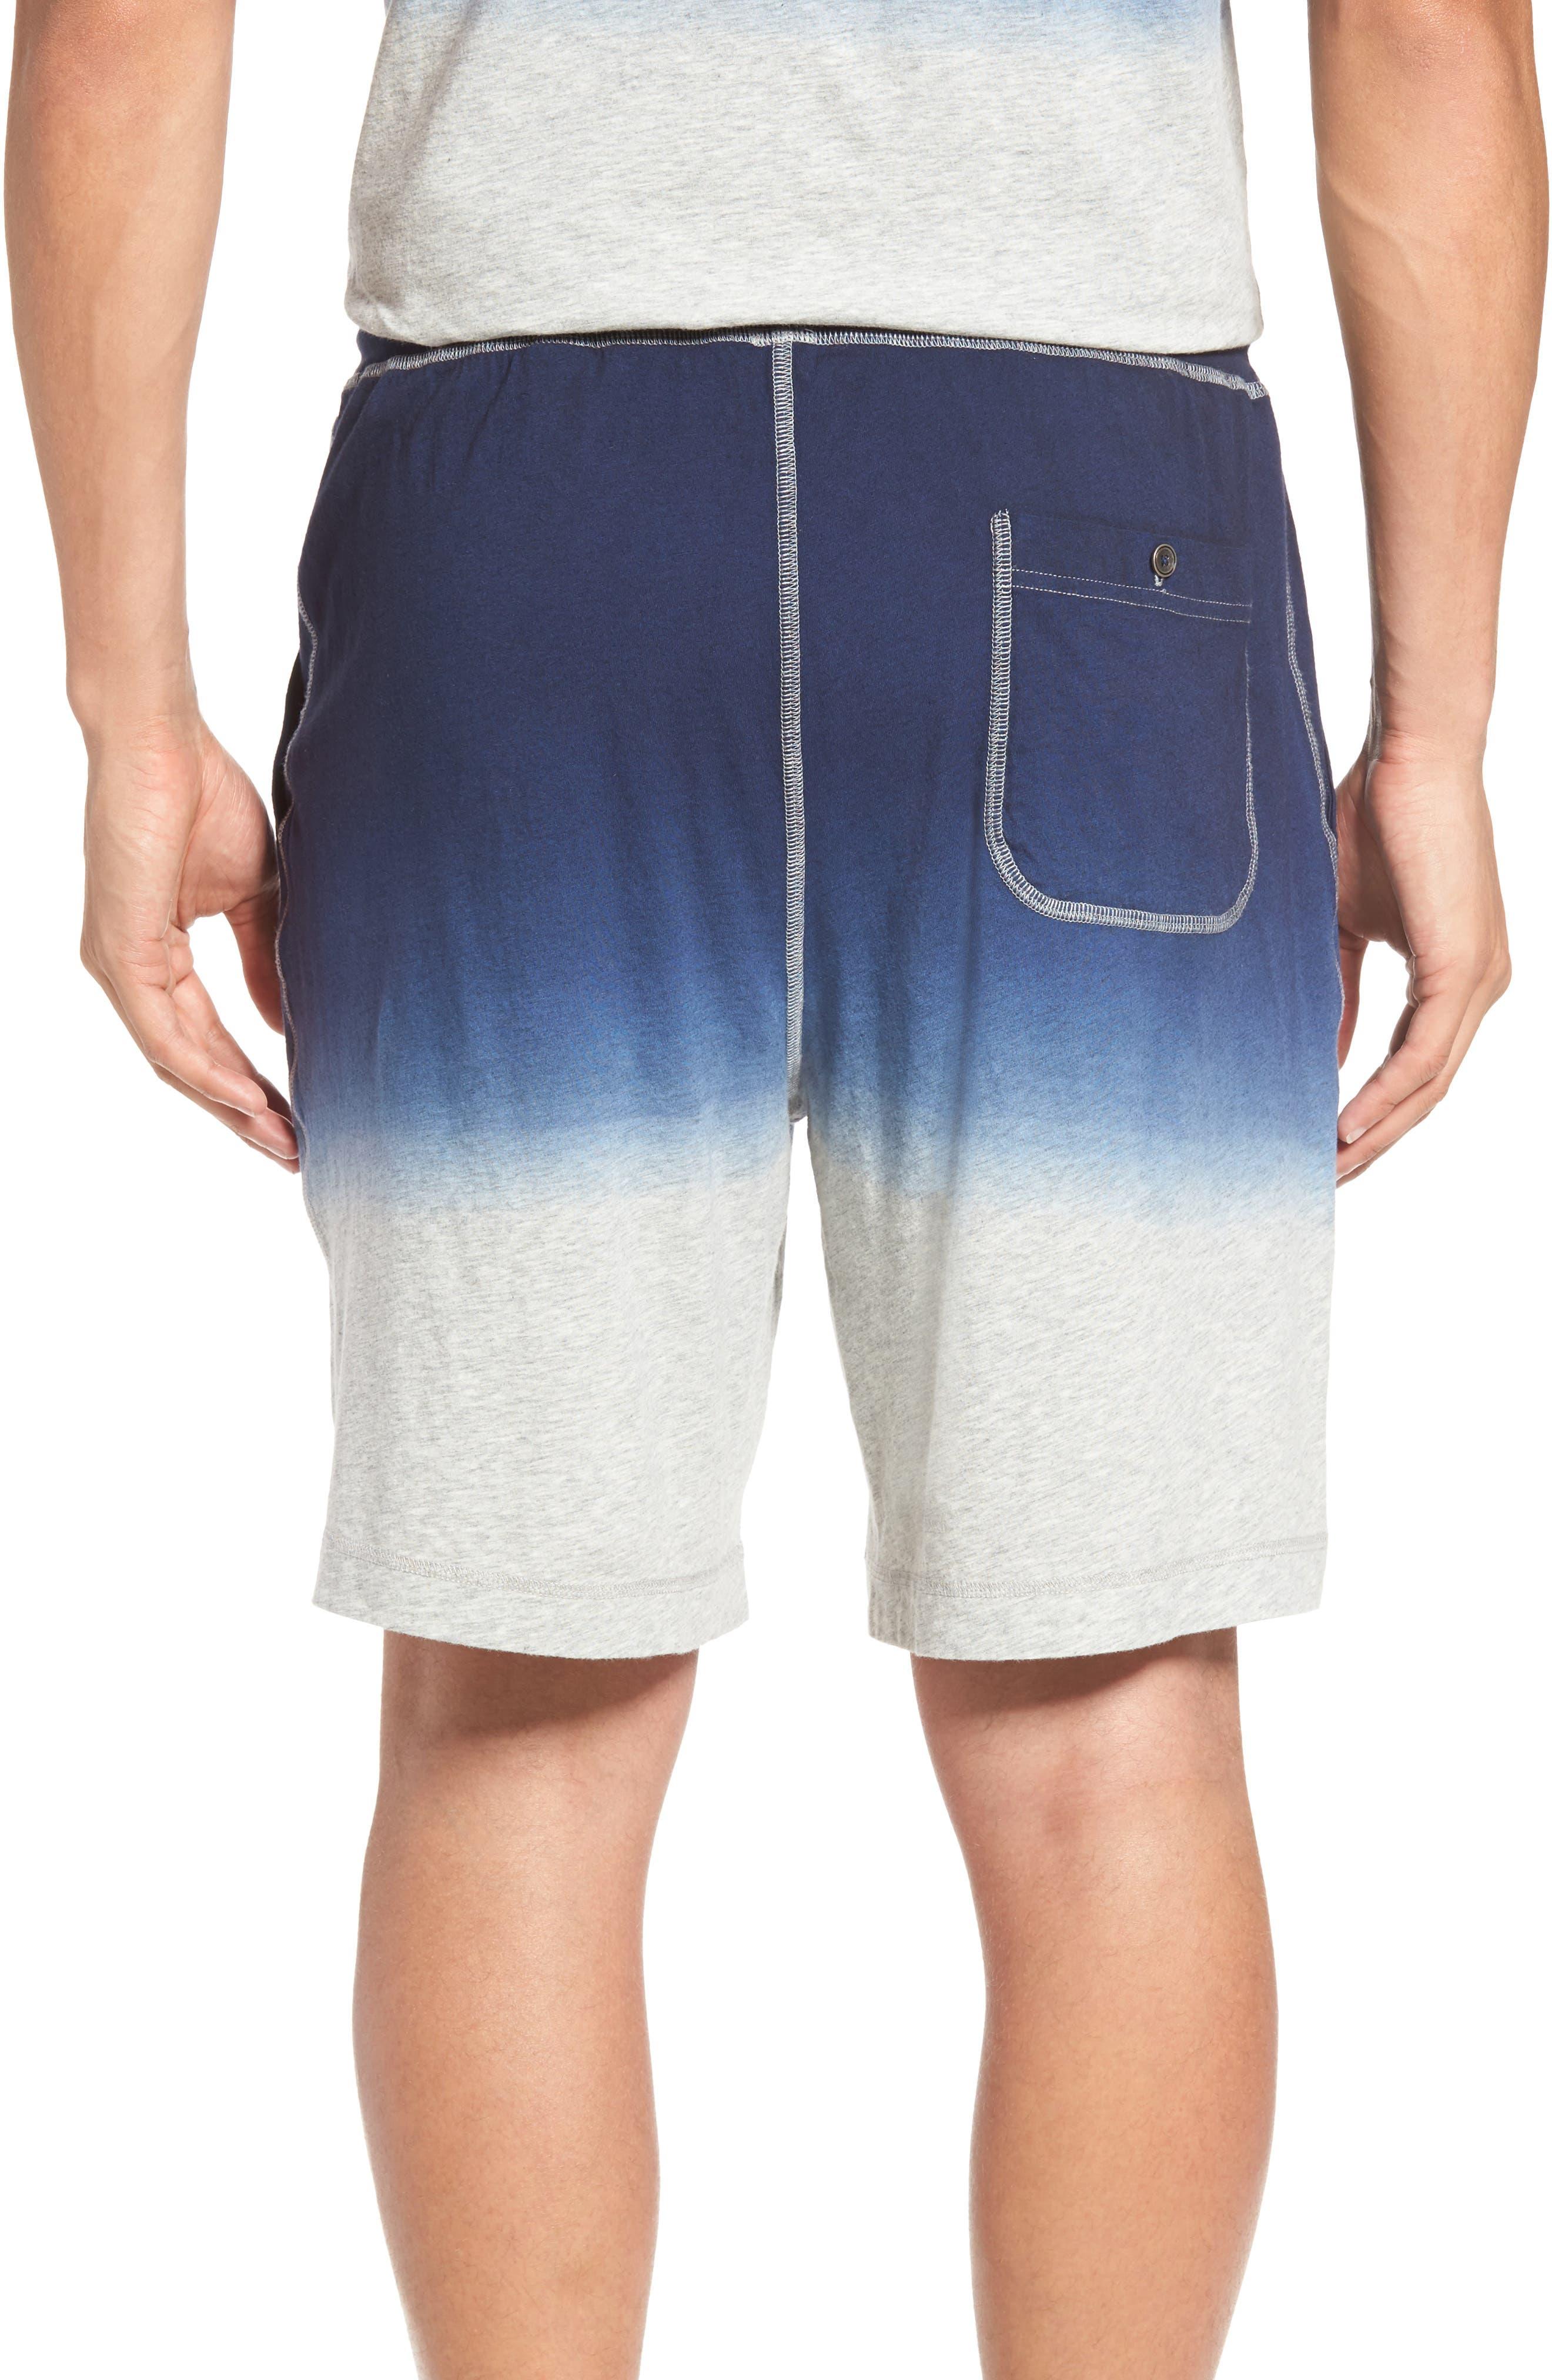 Dip Dye Lounge Shorts,                             Alternate thumbnail 2, color,                             410